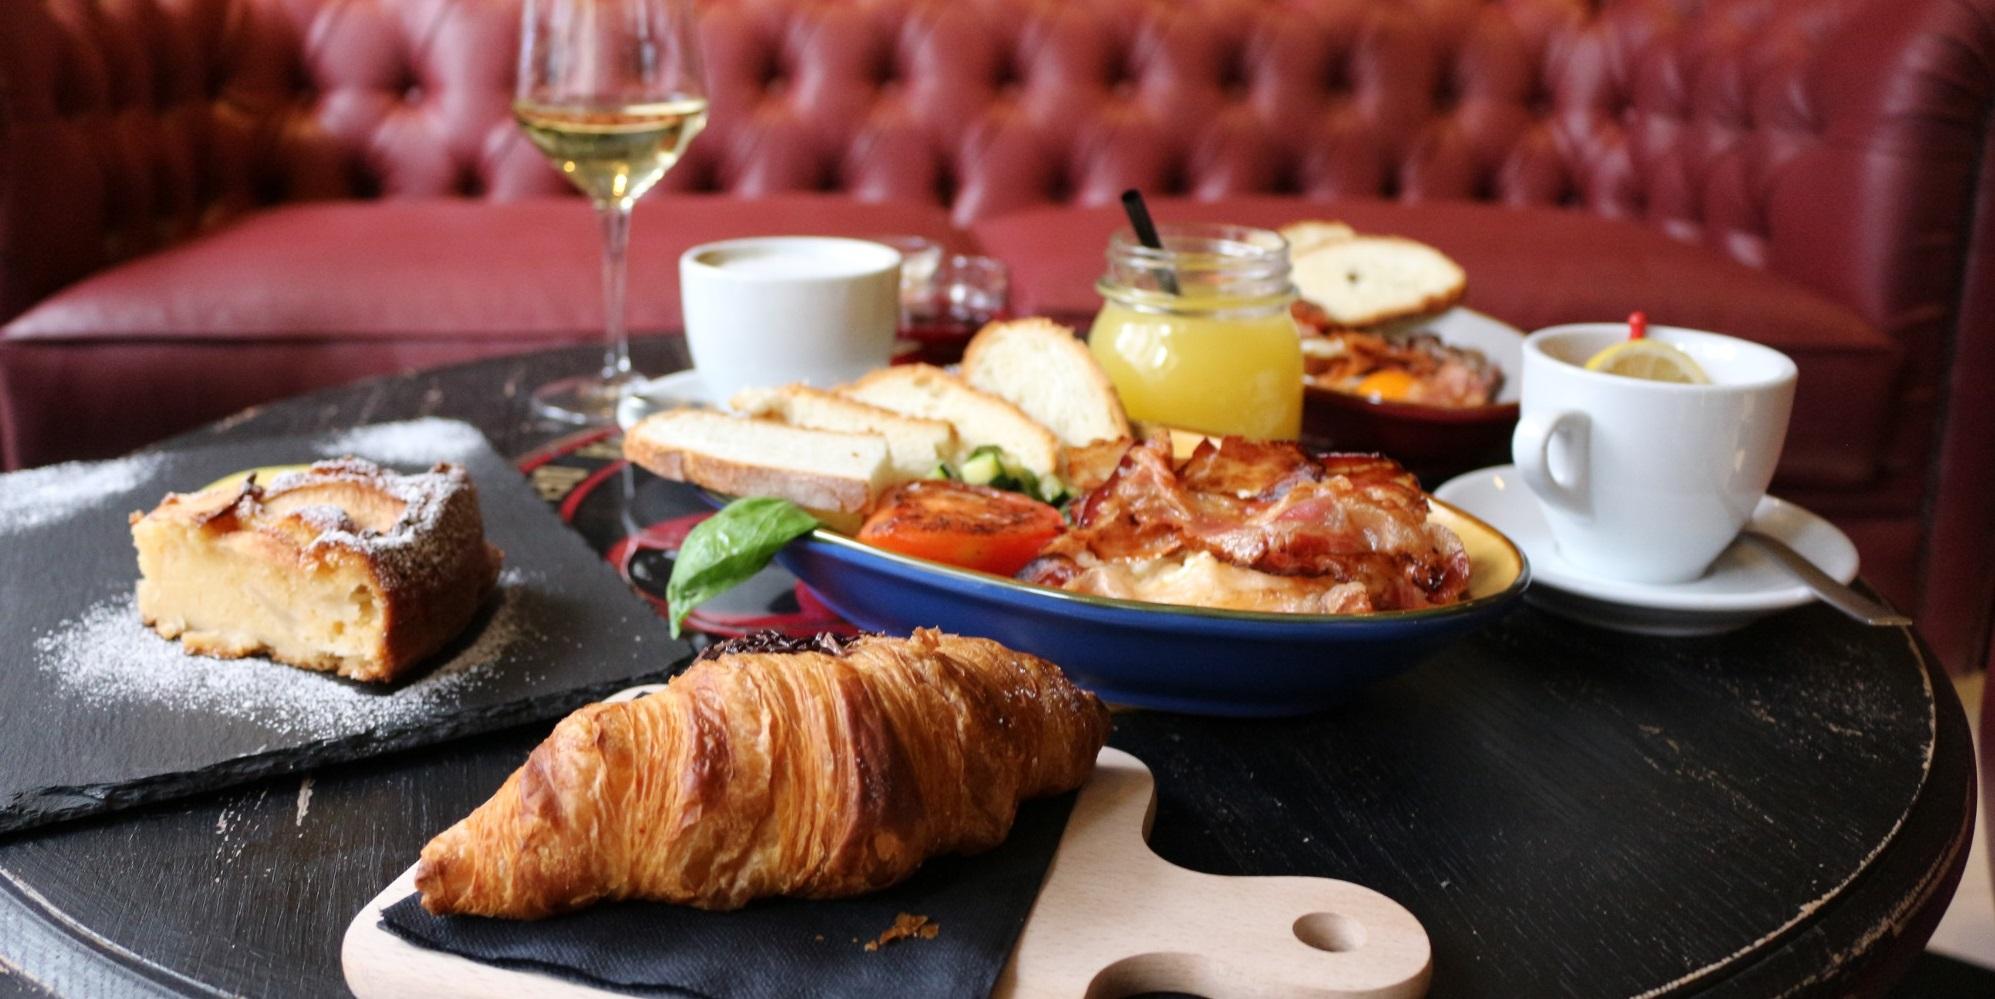 Brunch CrudoCotto Prosciutto Wine Bar & Restaurant (20121 Milano)